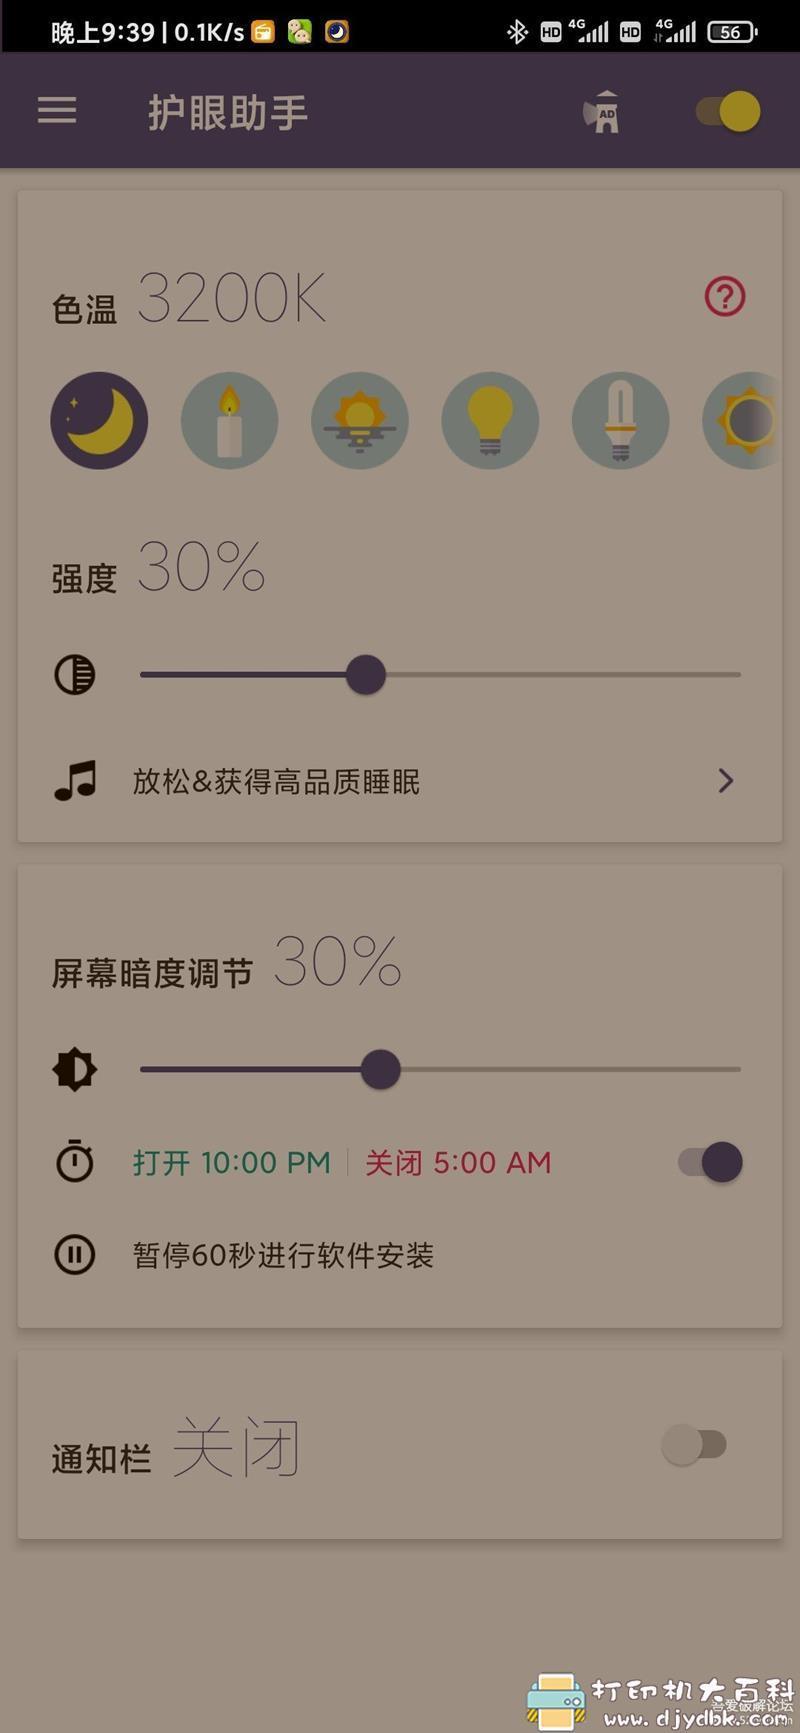 [Android]安卓无广告版的护眼app,blue light filter-night mode1.4.7n图片